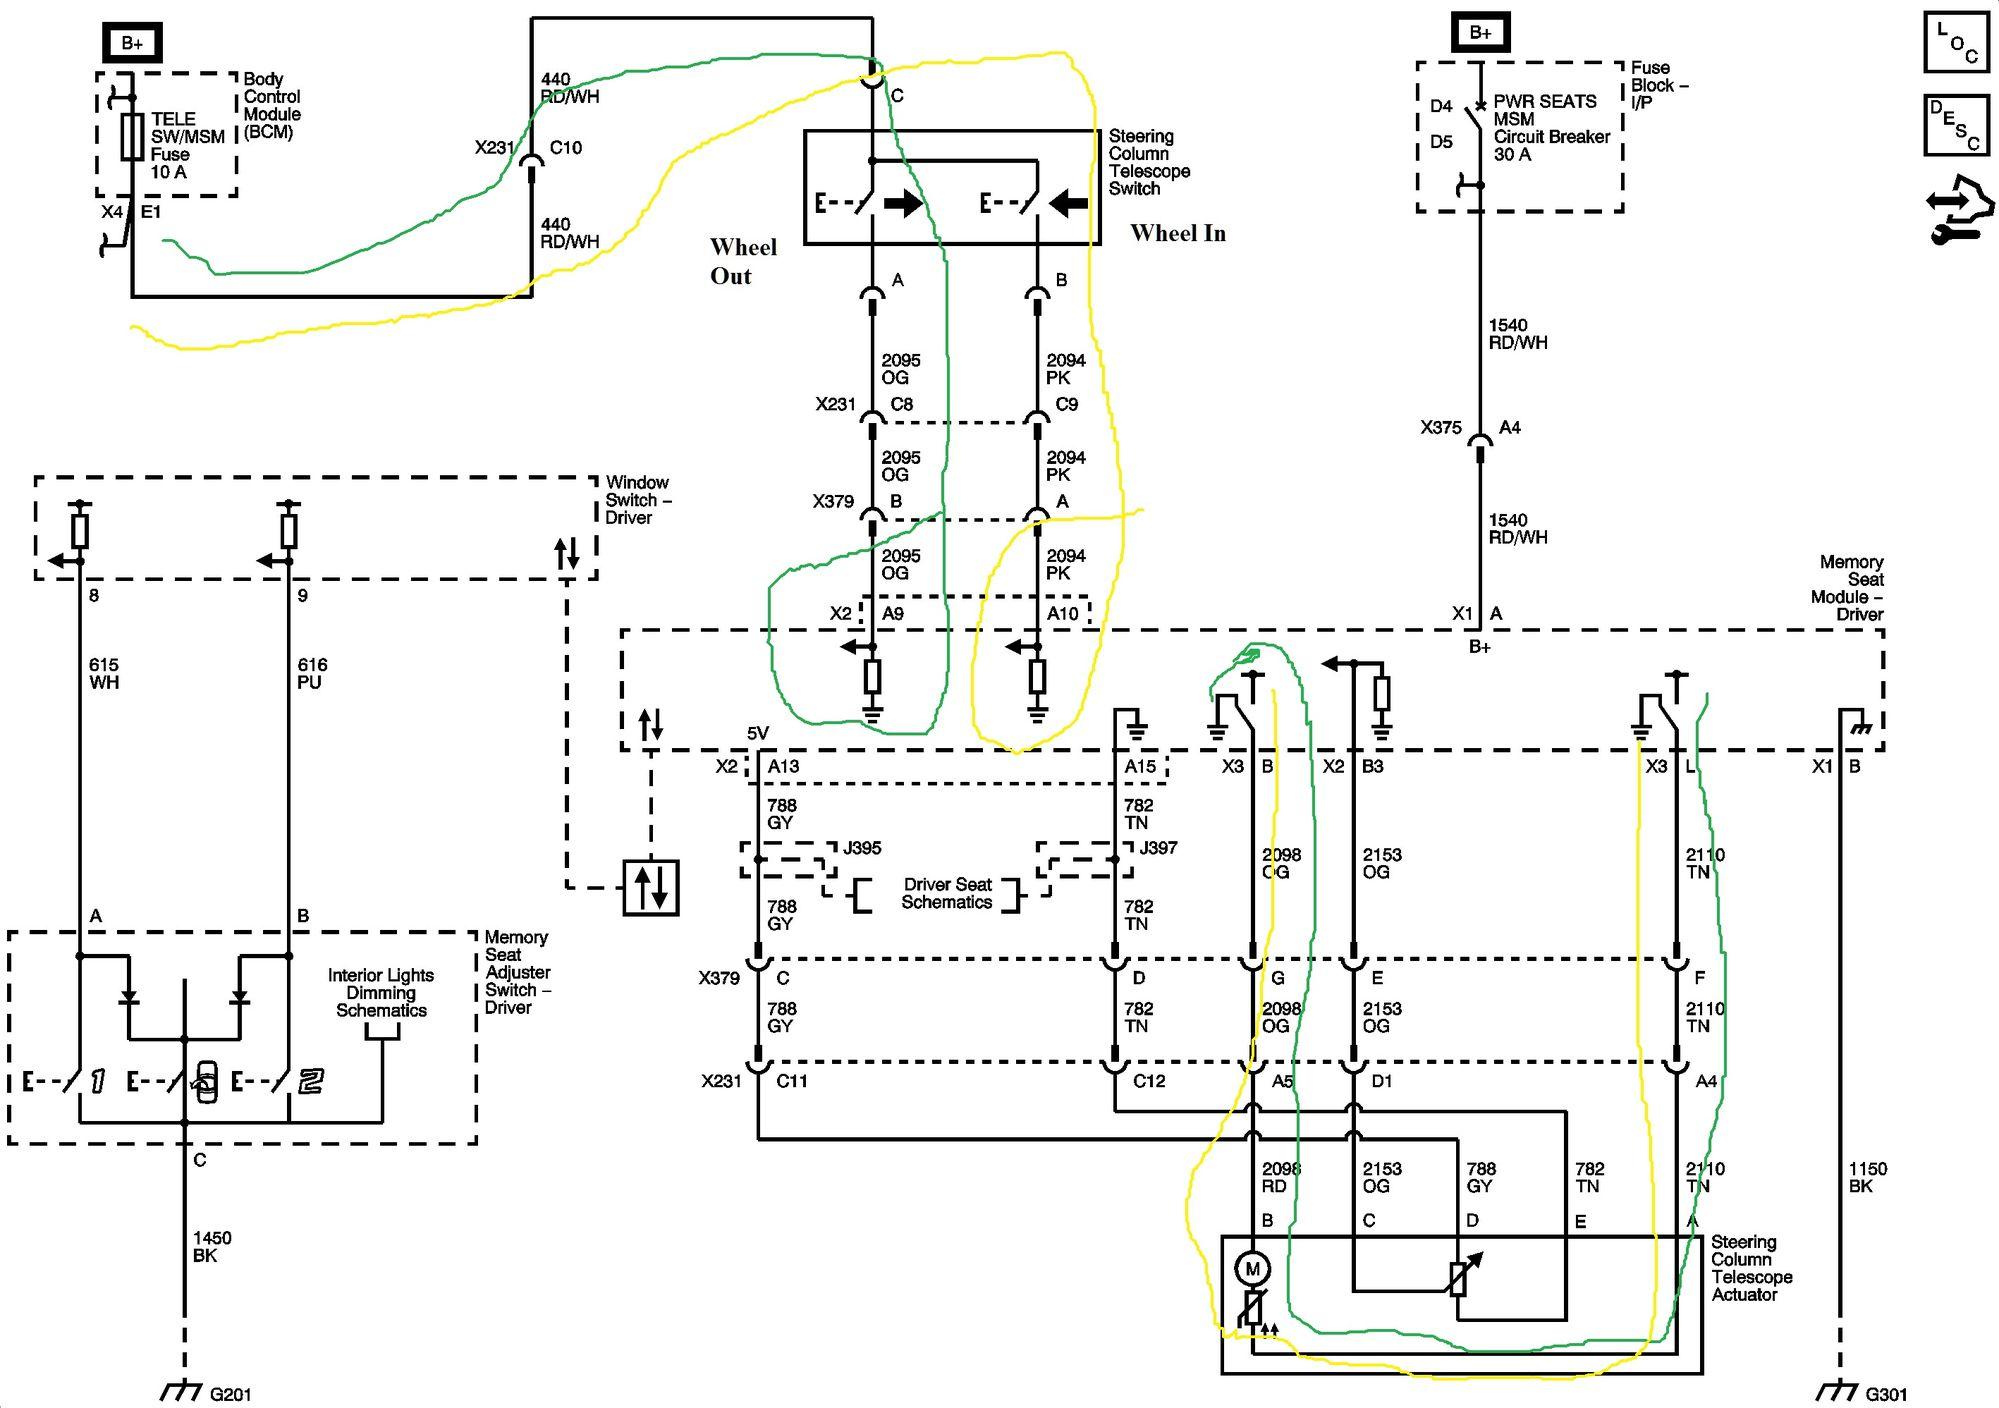 67 buick wiring diagram 67 buick wiring diagram e3 wiring diagram  67 buick wiring diagram e3 wiring diagram